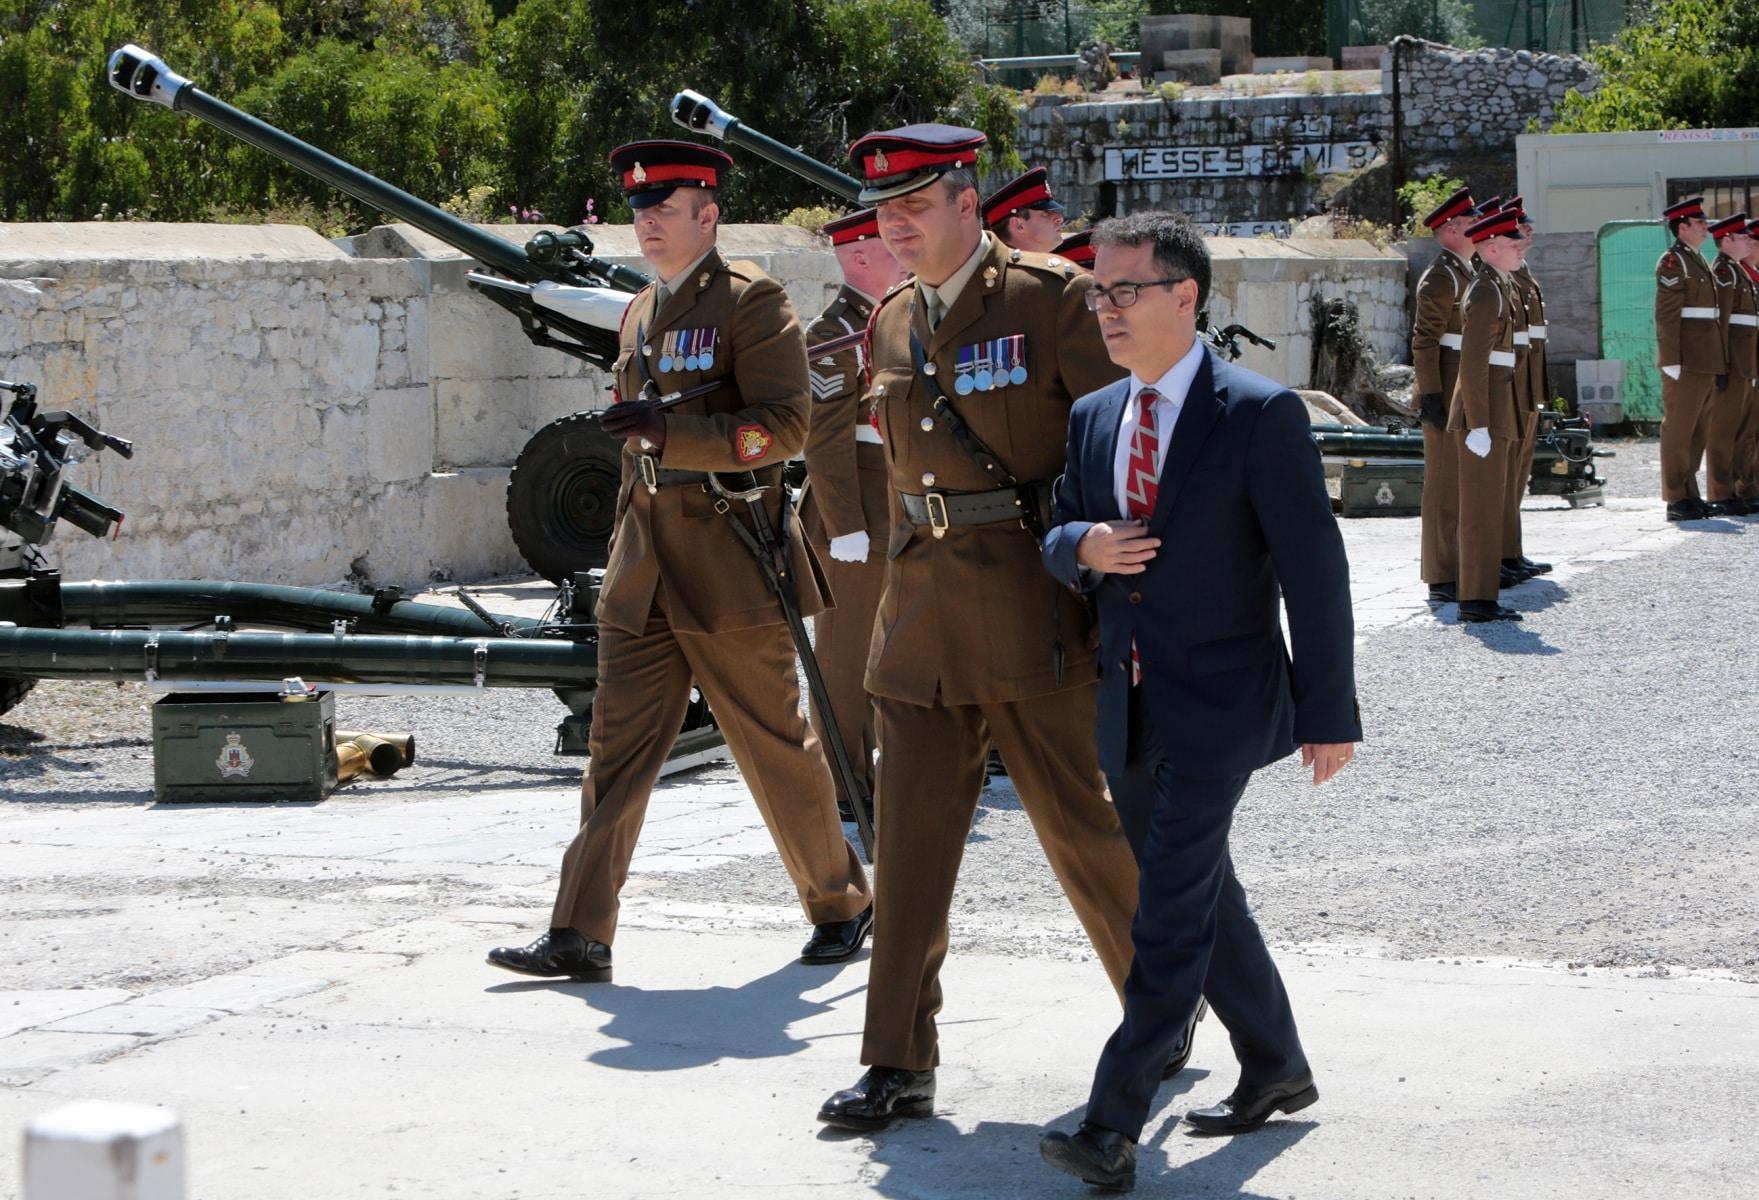 2-jun-2016-salvas-en-gibraltar-honor-al-aniversario-de-coronacin-de-la-reina_26810216343_o